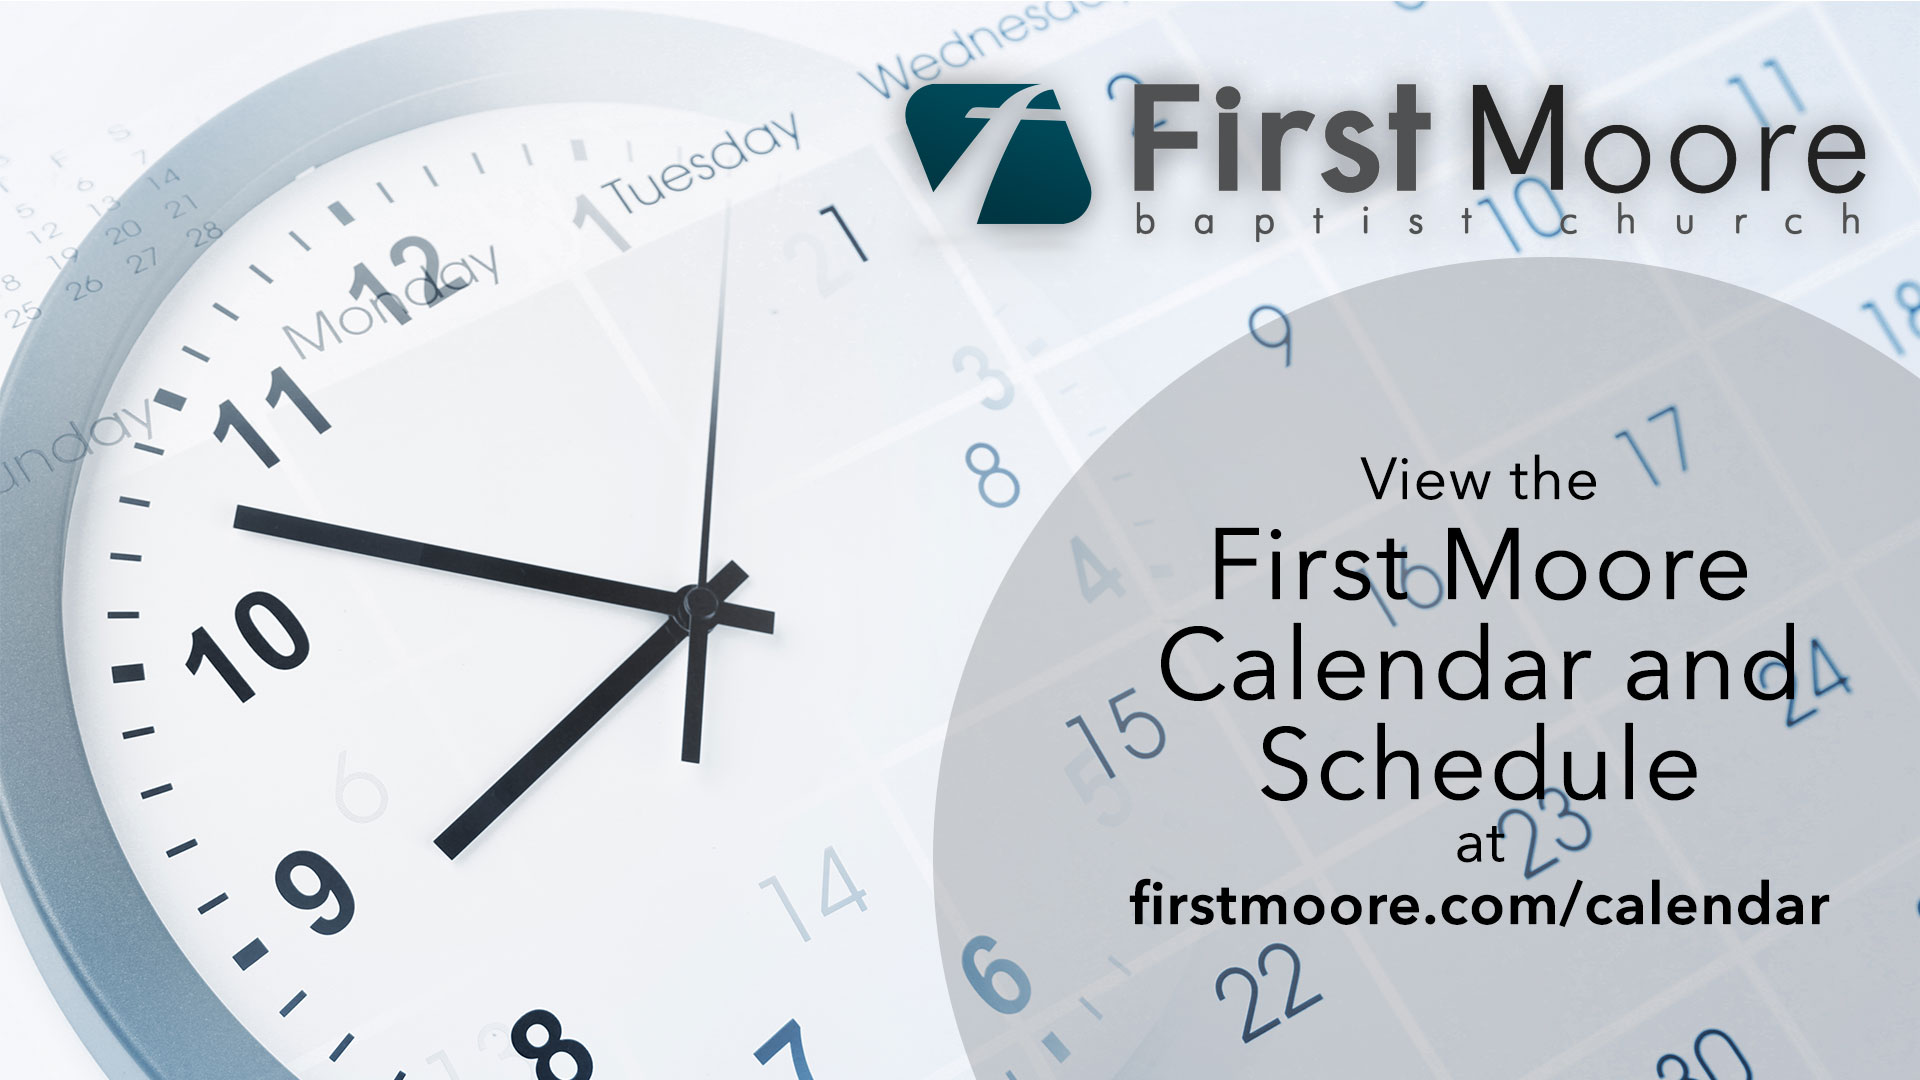 firstmoore_calendar_cta.jpg